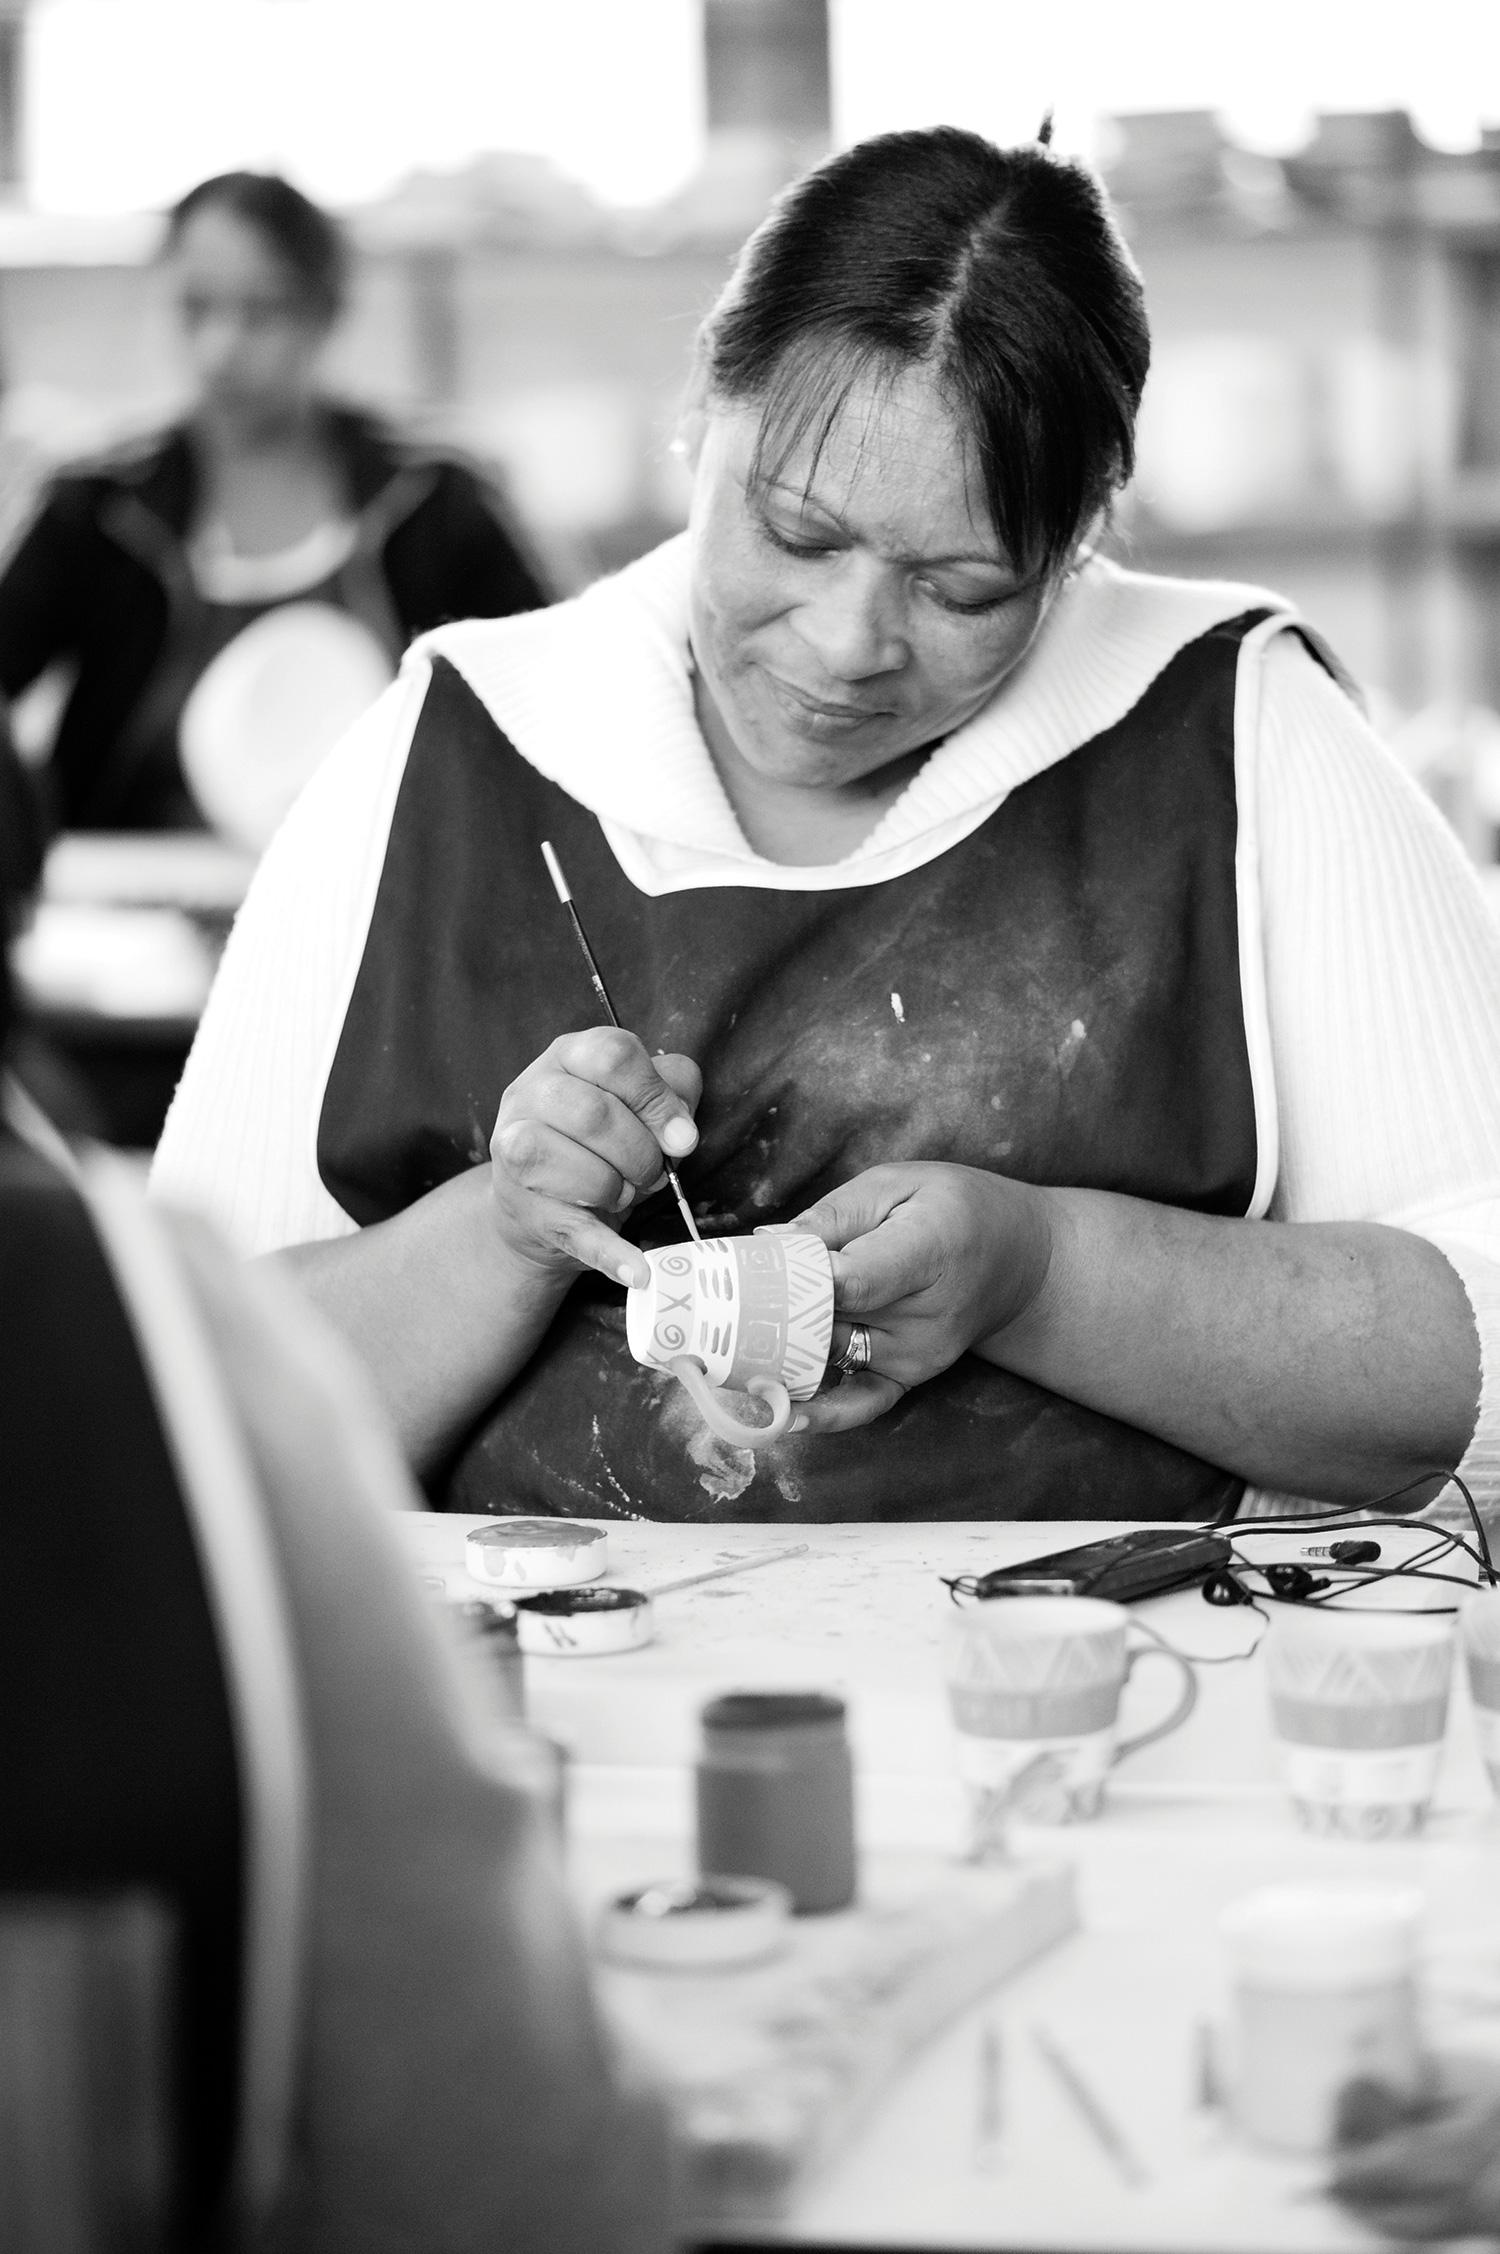 kapula-handmade-hand-painted-ceramic-espresso-cup-women-painting.jpg